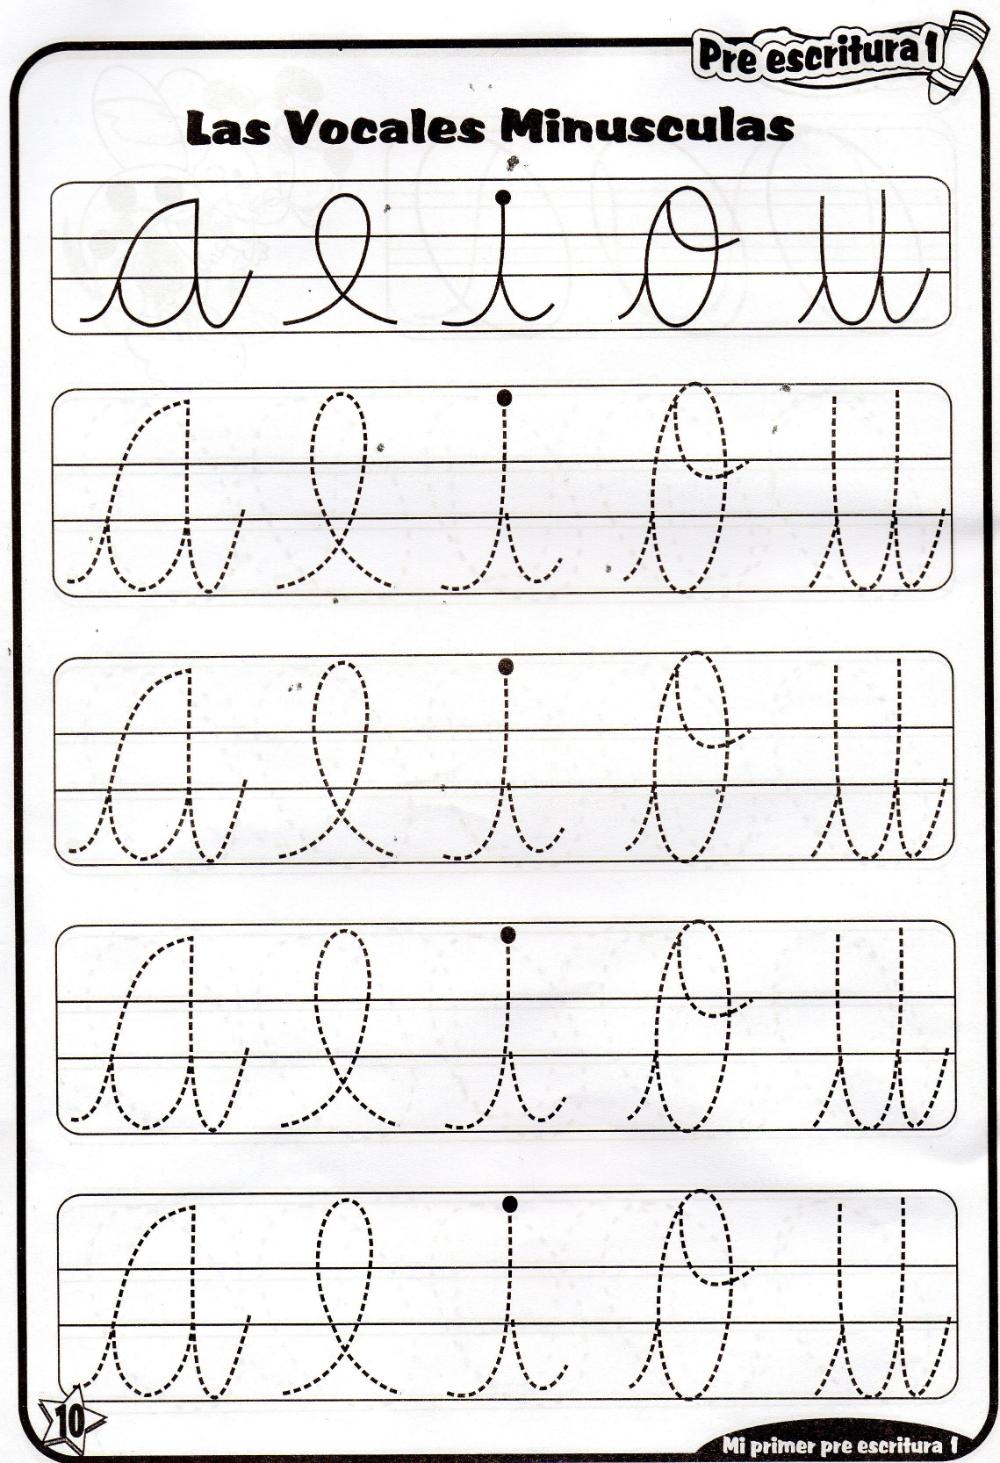 Talleres Para Niños 5 Años Para Imprimir Búsqueda De Google Preschool Writing Teaching Cursive Kindergarten Literacy Worksheets